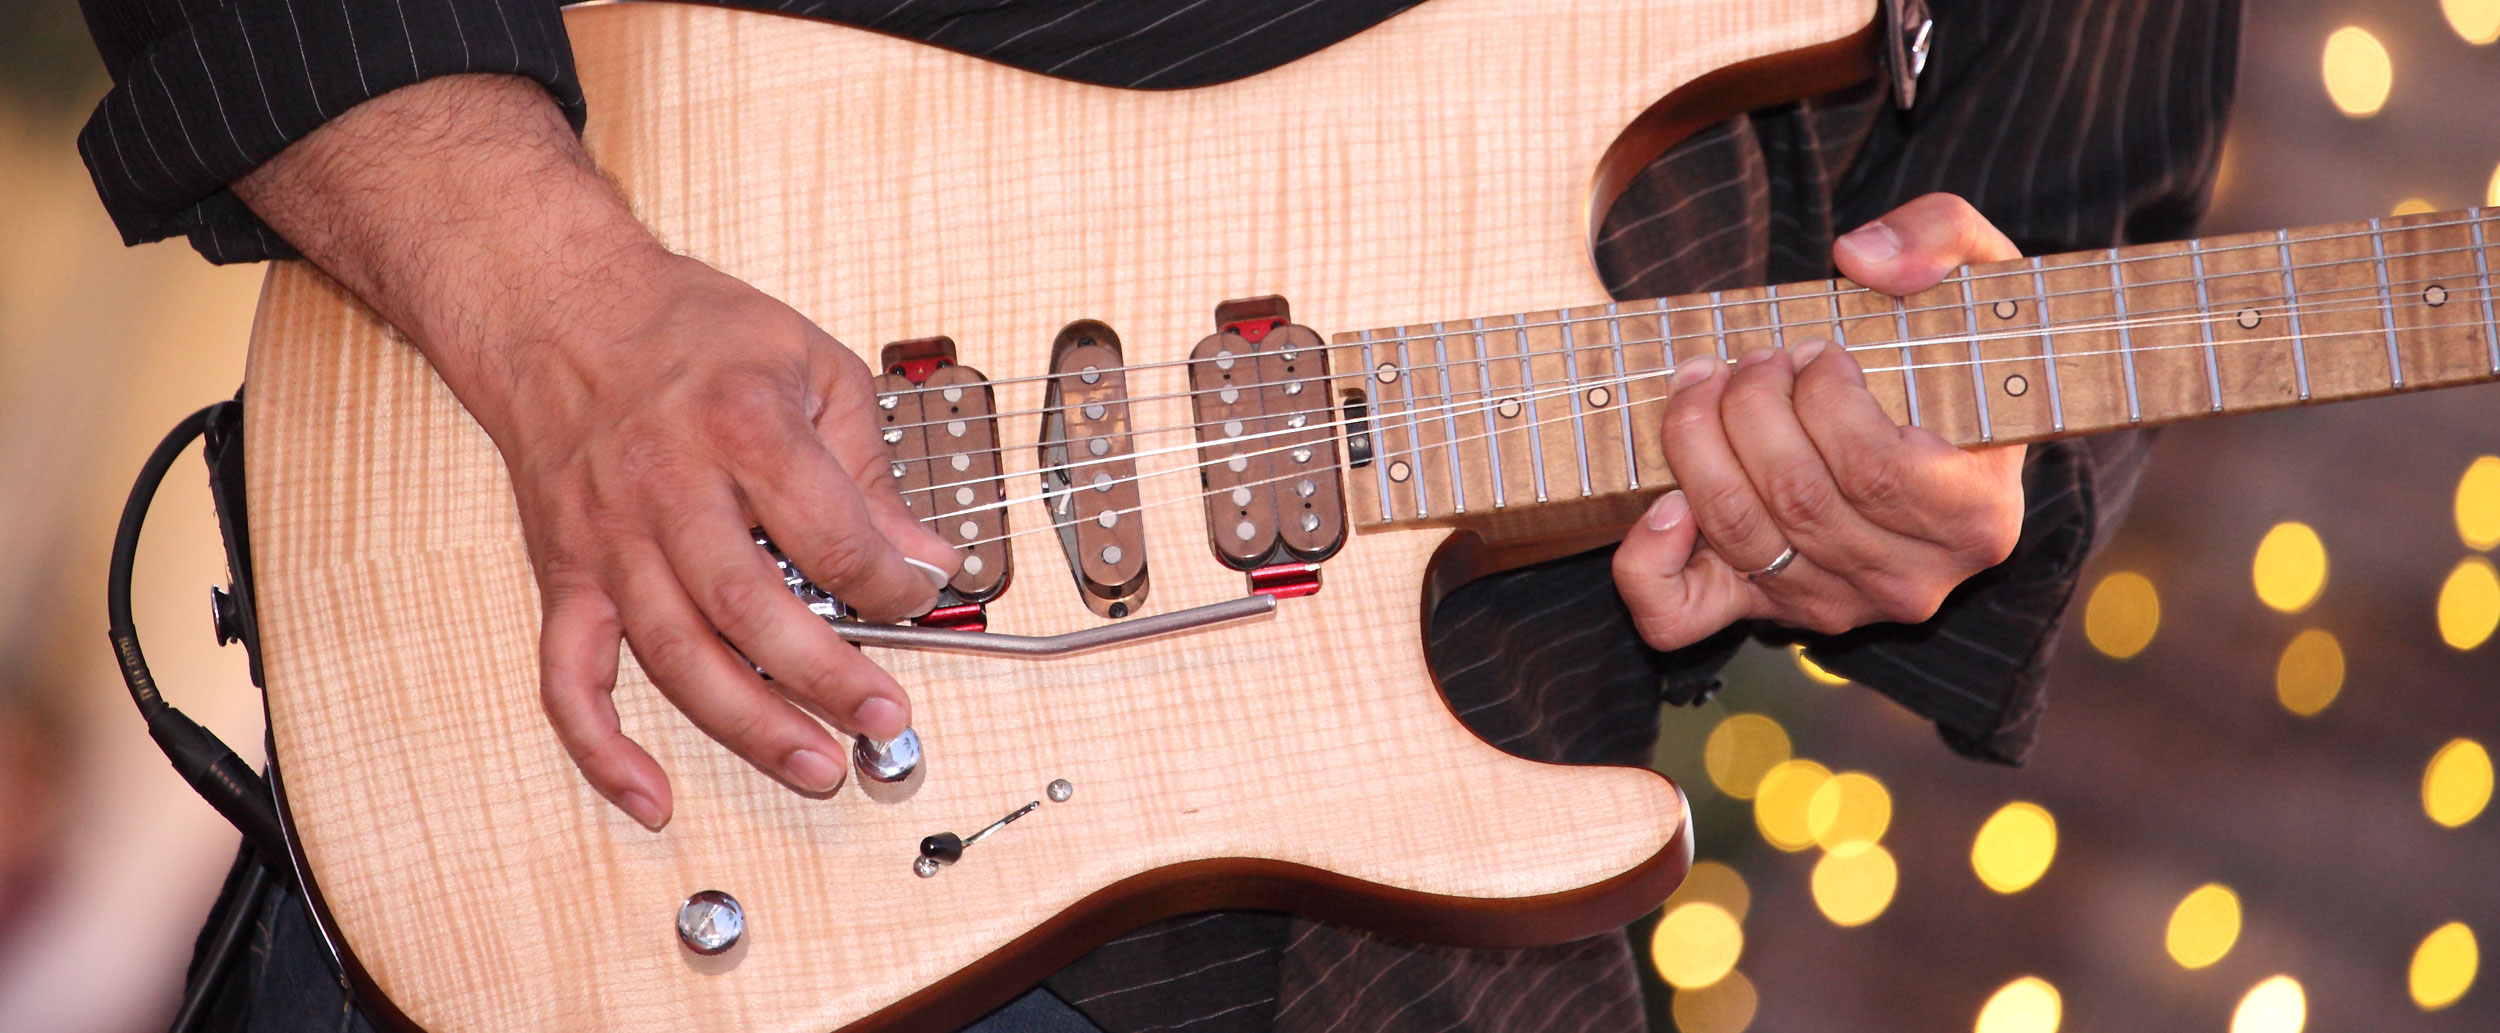 Guitar-bend-note